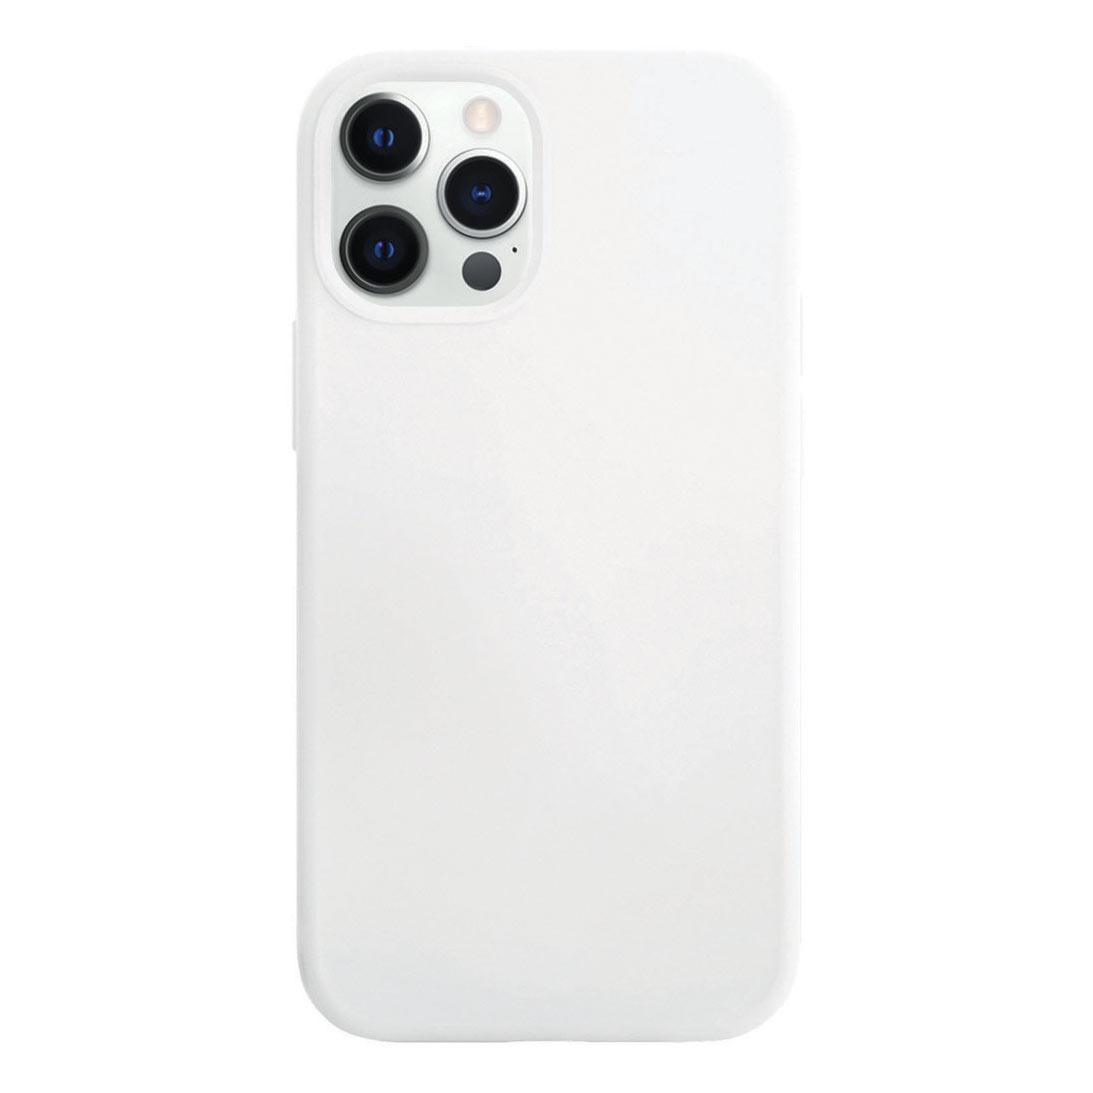 Чехол VLP Silicone Case для смартфона Apple iPhone 12/12 Pro, белый